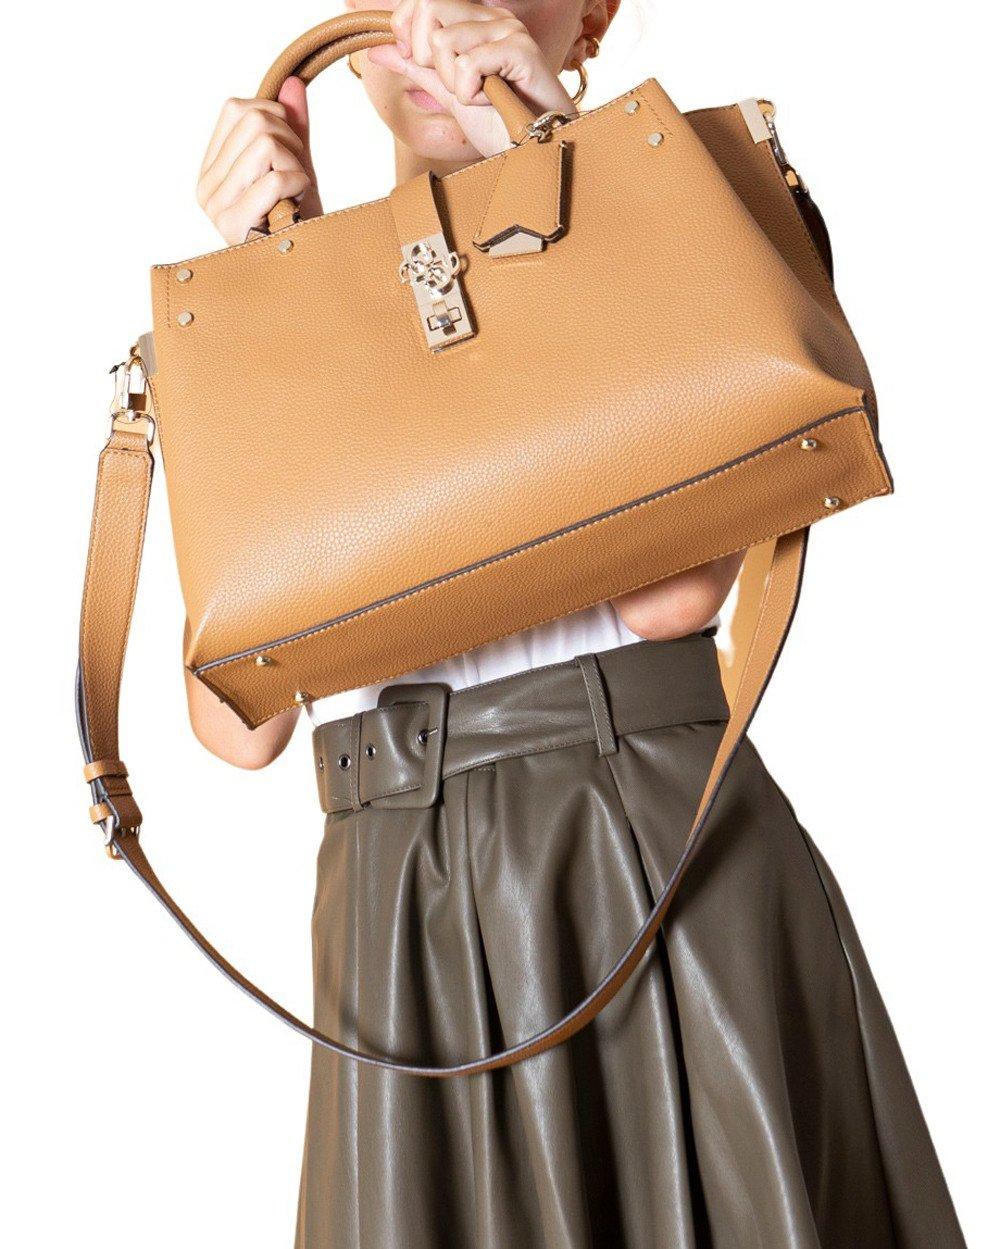 Guess Women's Handbag Various Colours 305758 - beige UNICA